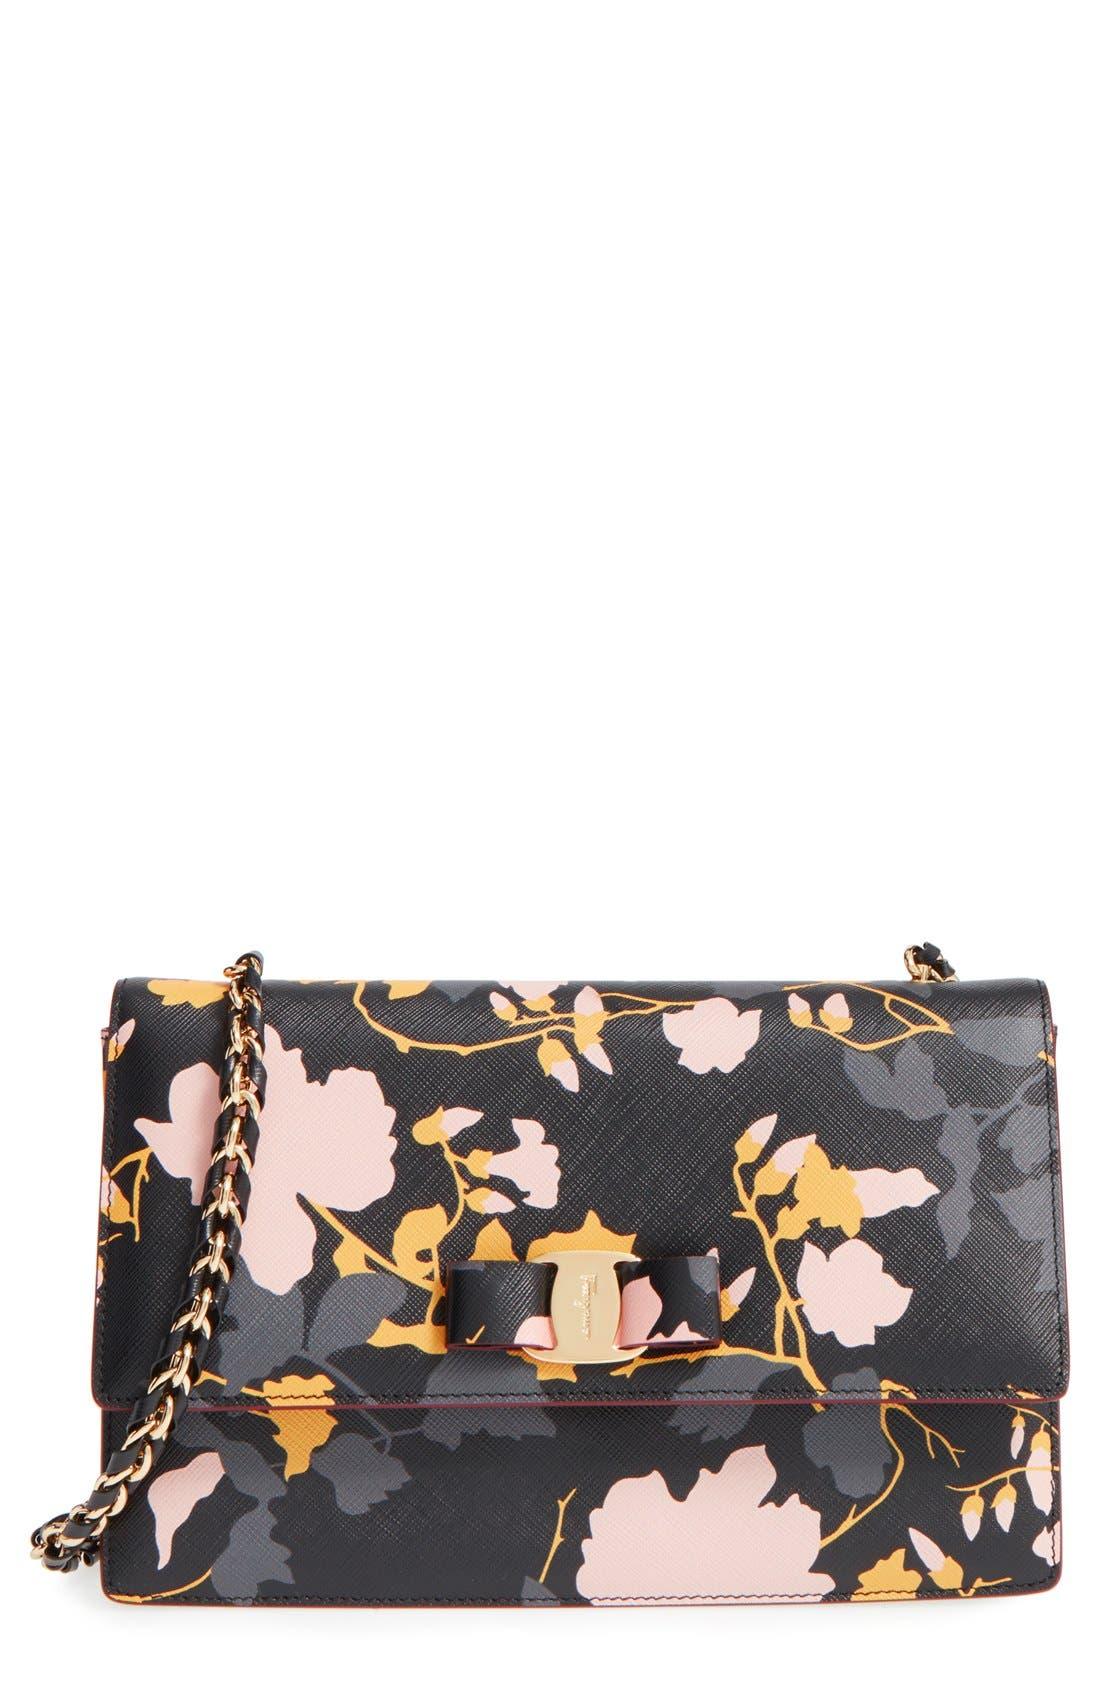 Alternate Image 1 Selected - Salvatore Ferragamo 'Medium Ginny Floral' Shoulder Bag